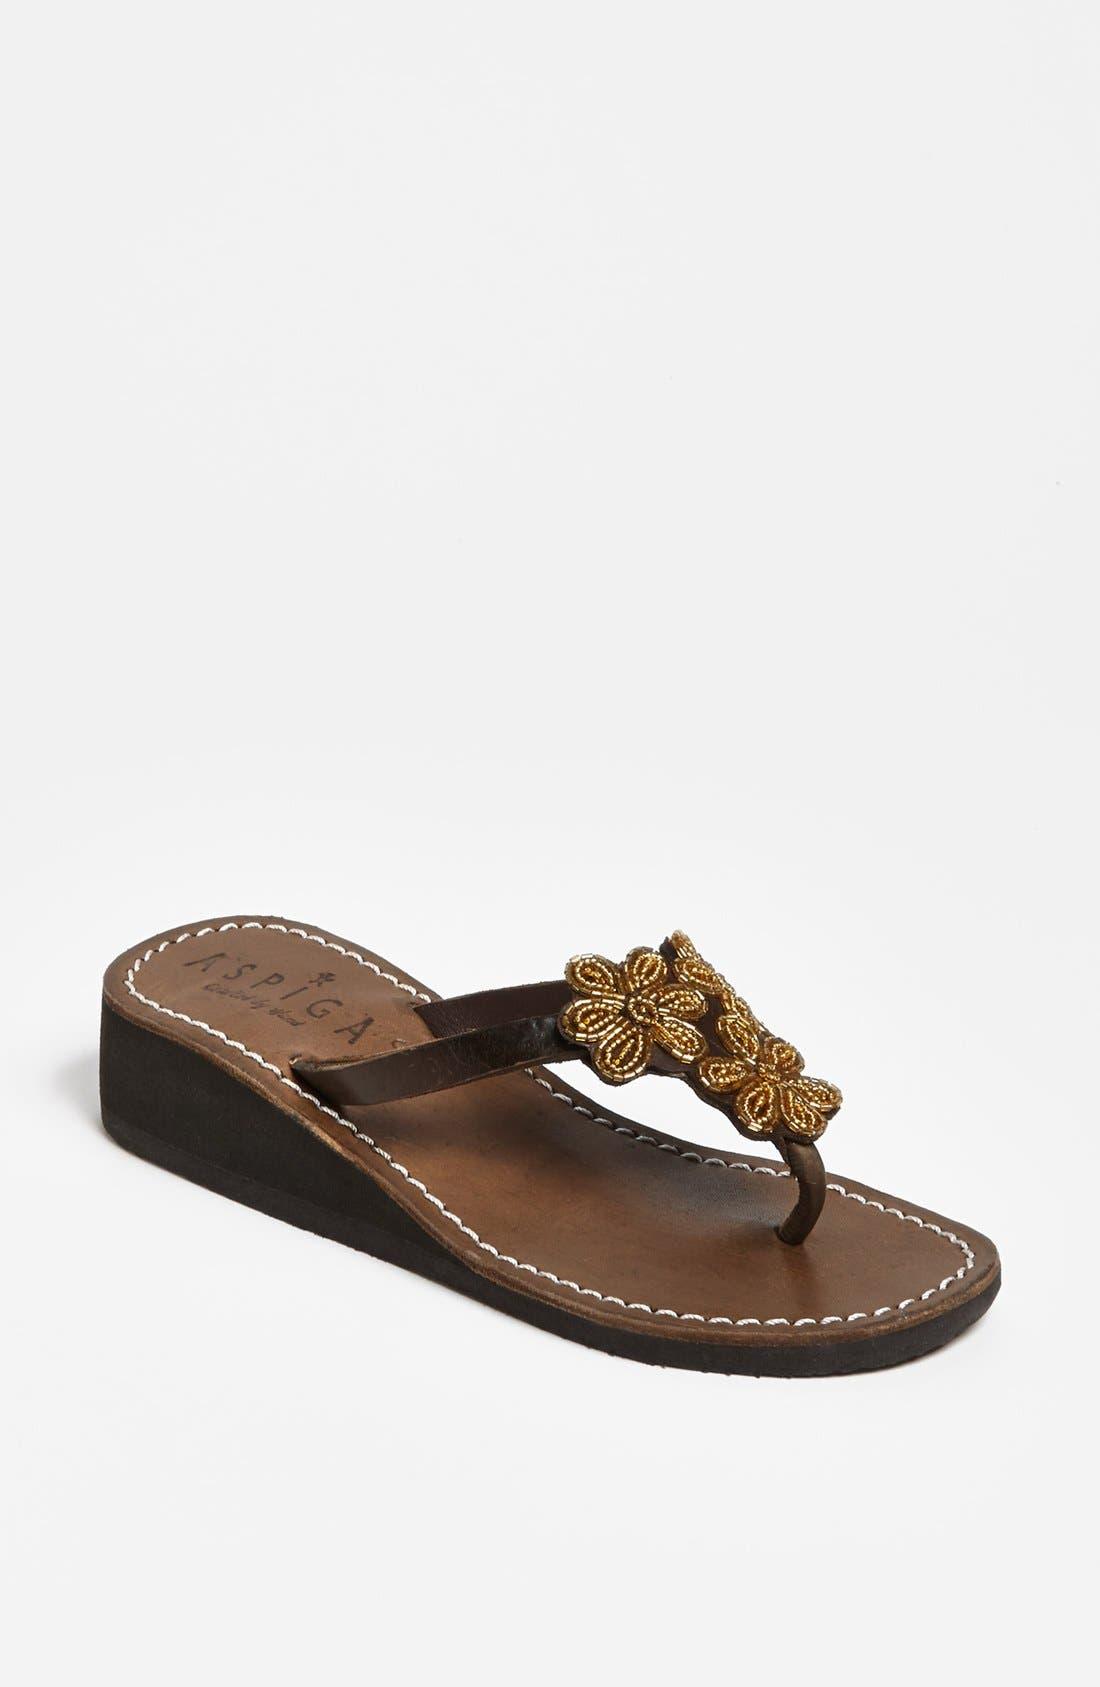 Alternate Image 1 Selected - Aspiga 'Minazi' Sandal